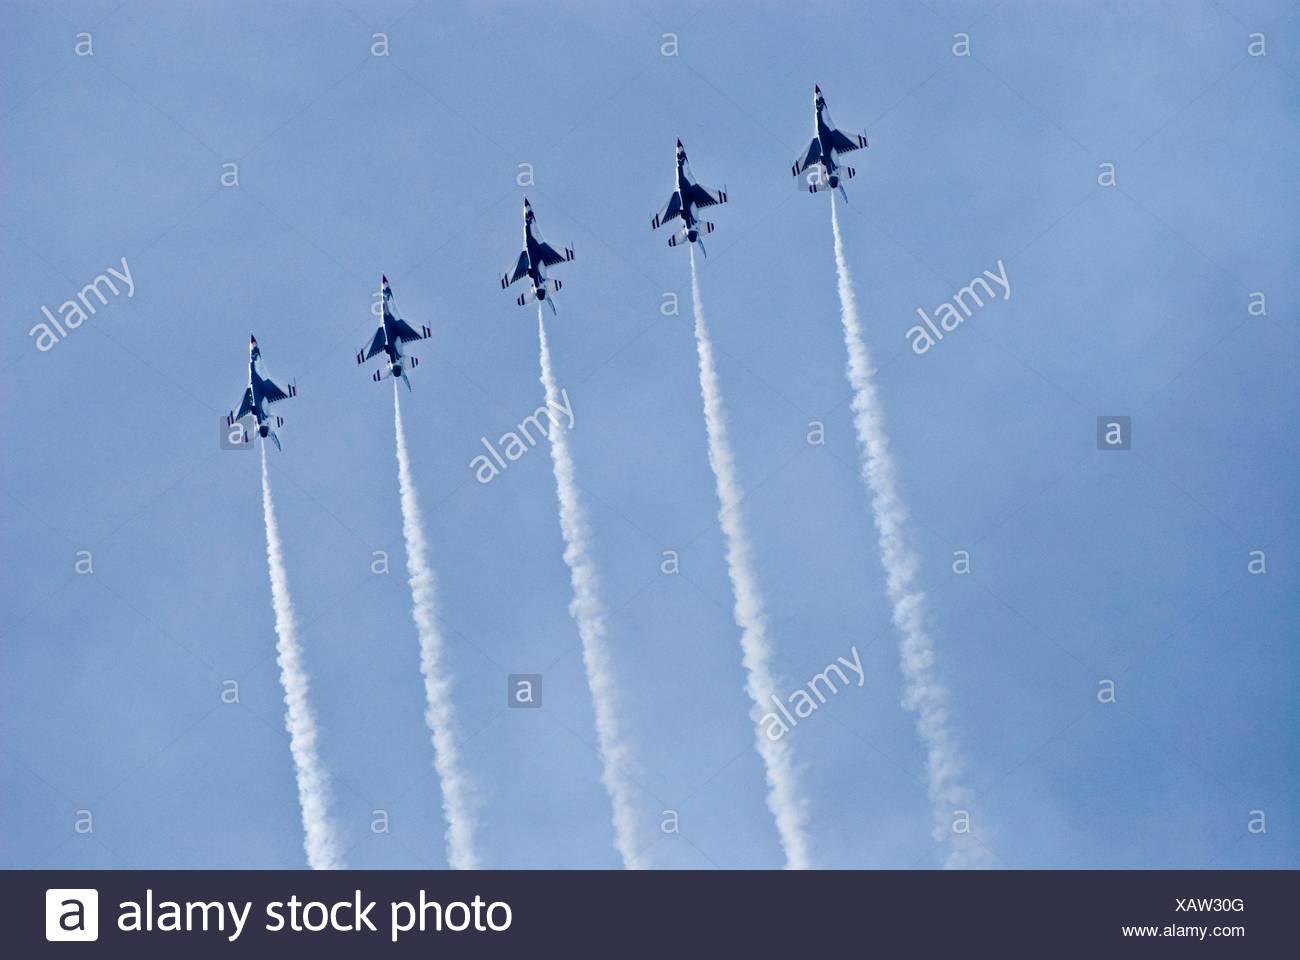 United States Air Force Thunderbirds Flight Team - Stock Image